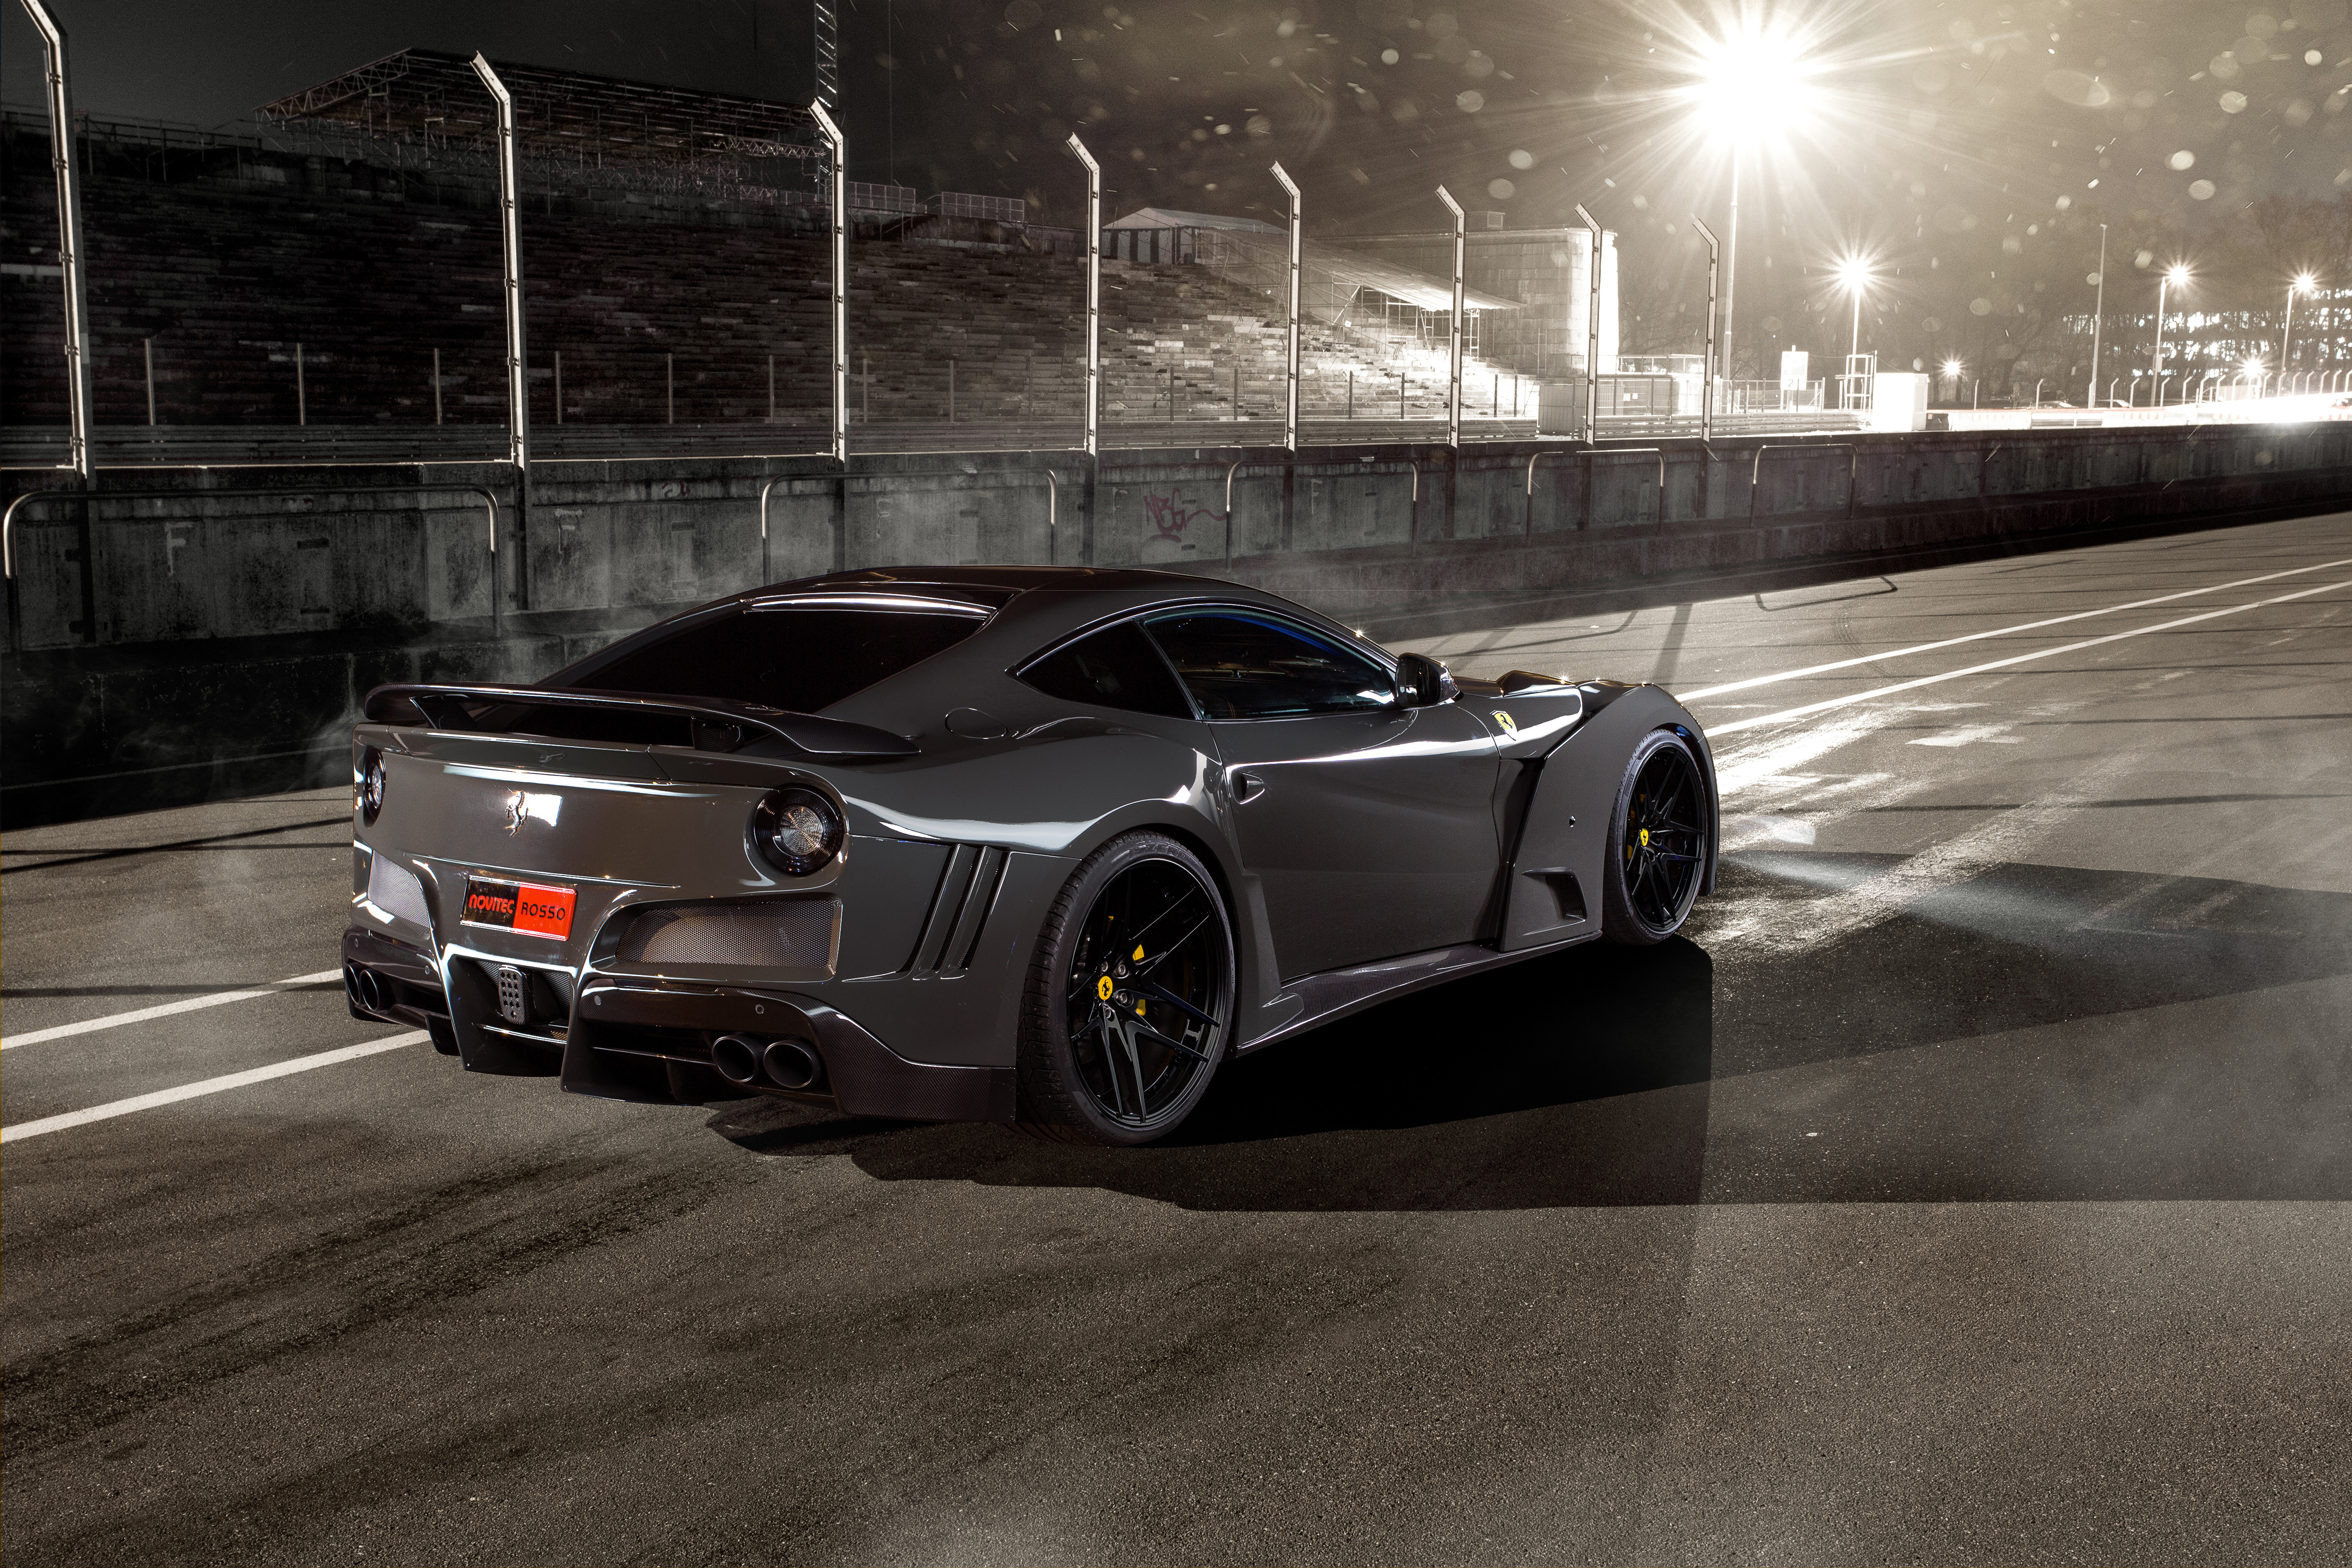 2016 Novitec Rosso Ferrari F12 Berlinetta 4k Ultra HD ...